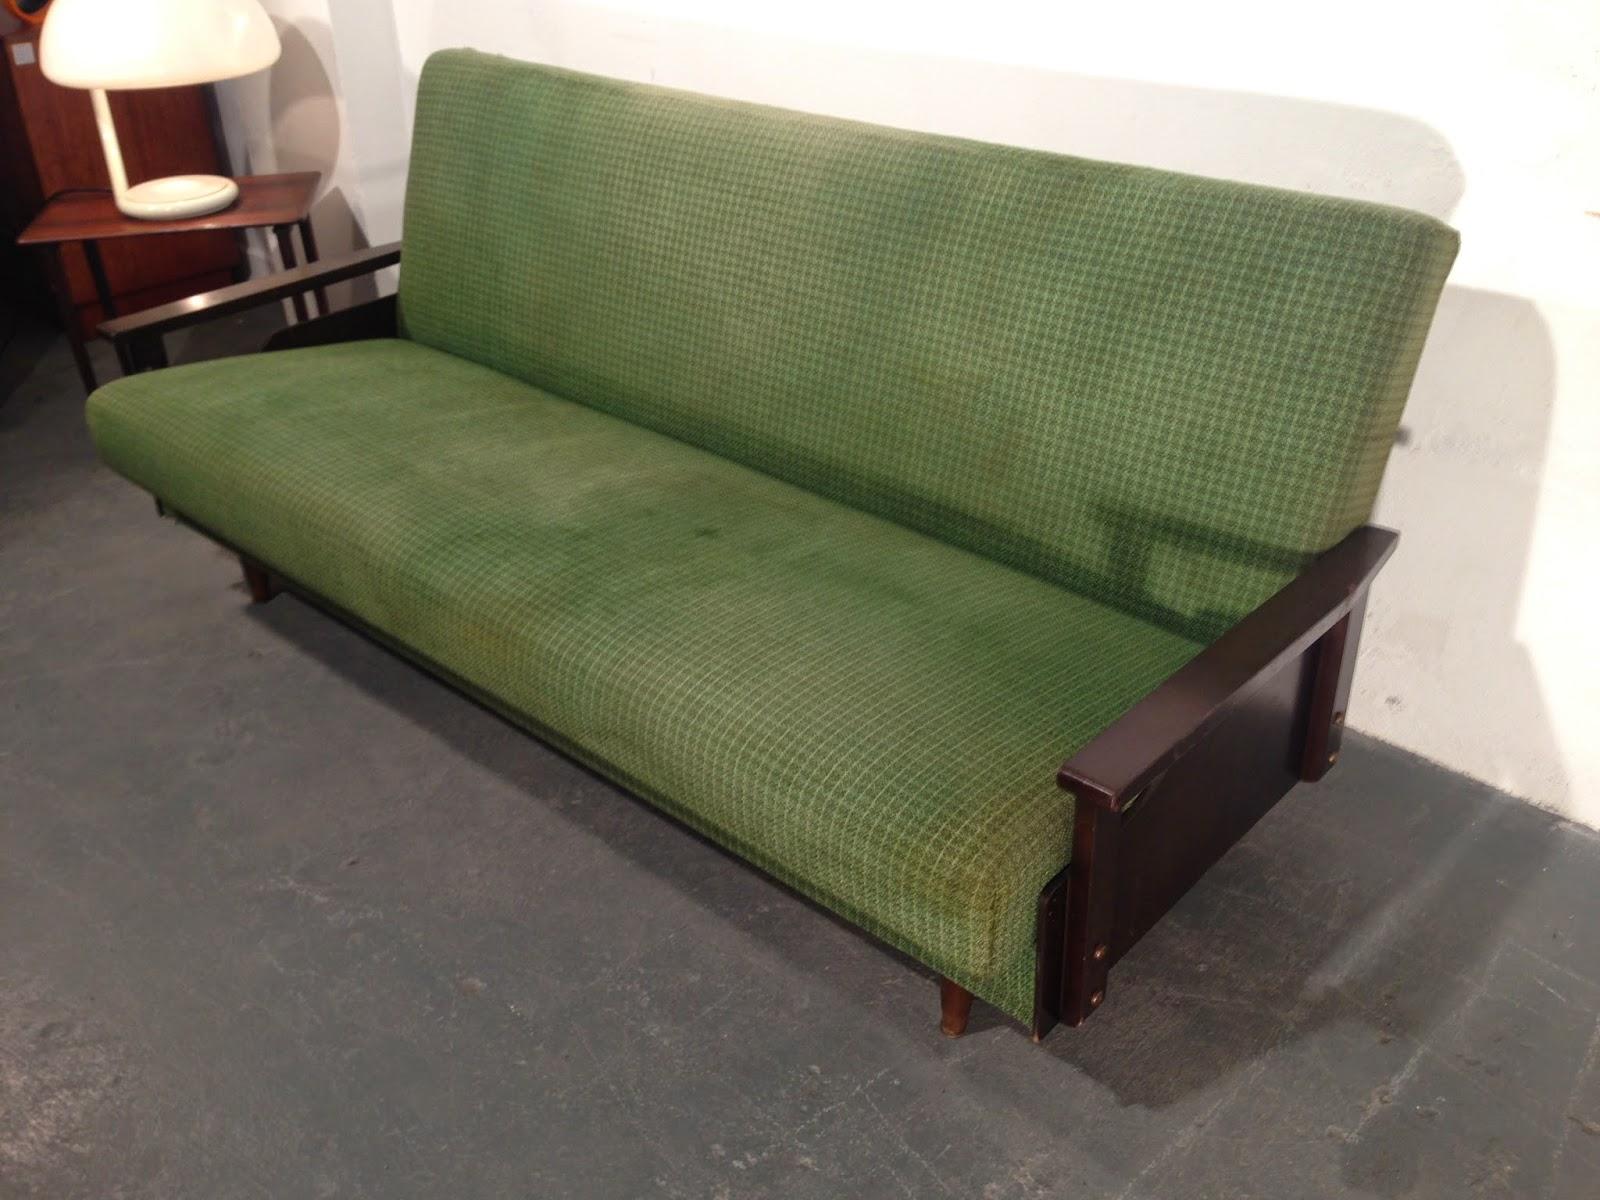 Scandinavian designs sleeper sofa sofa design for Variant of scandinavian designs sofa ideas